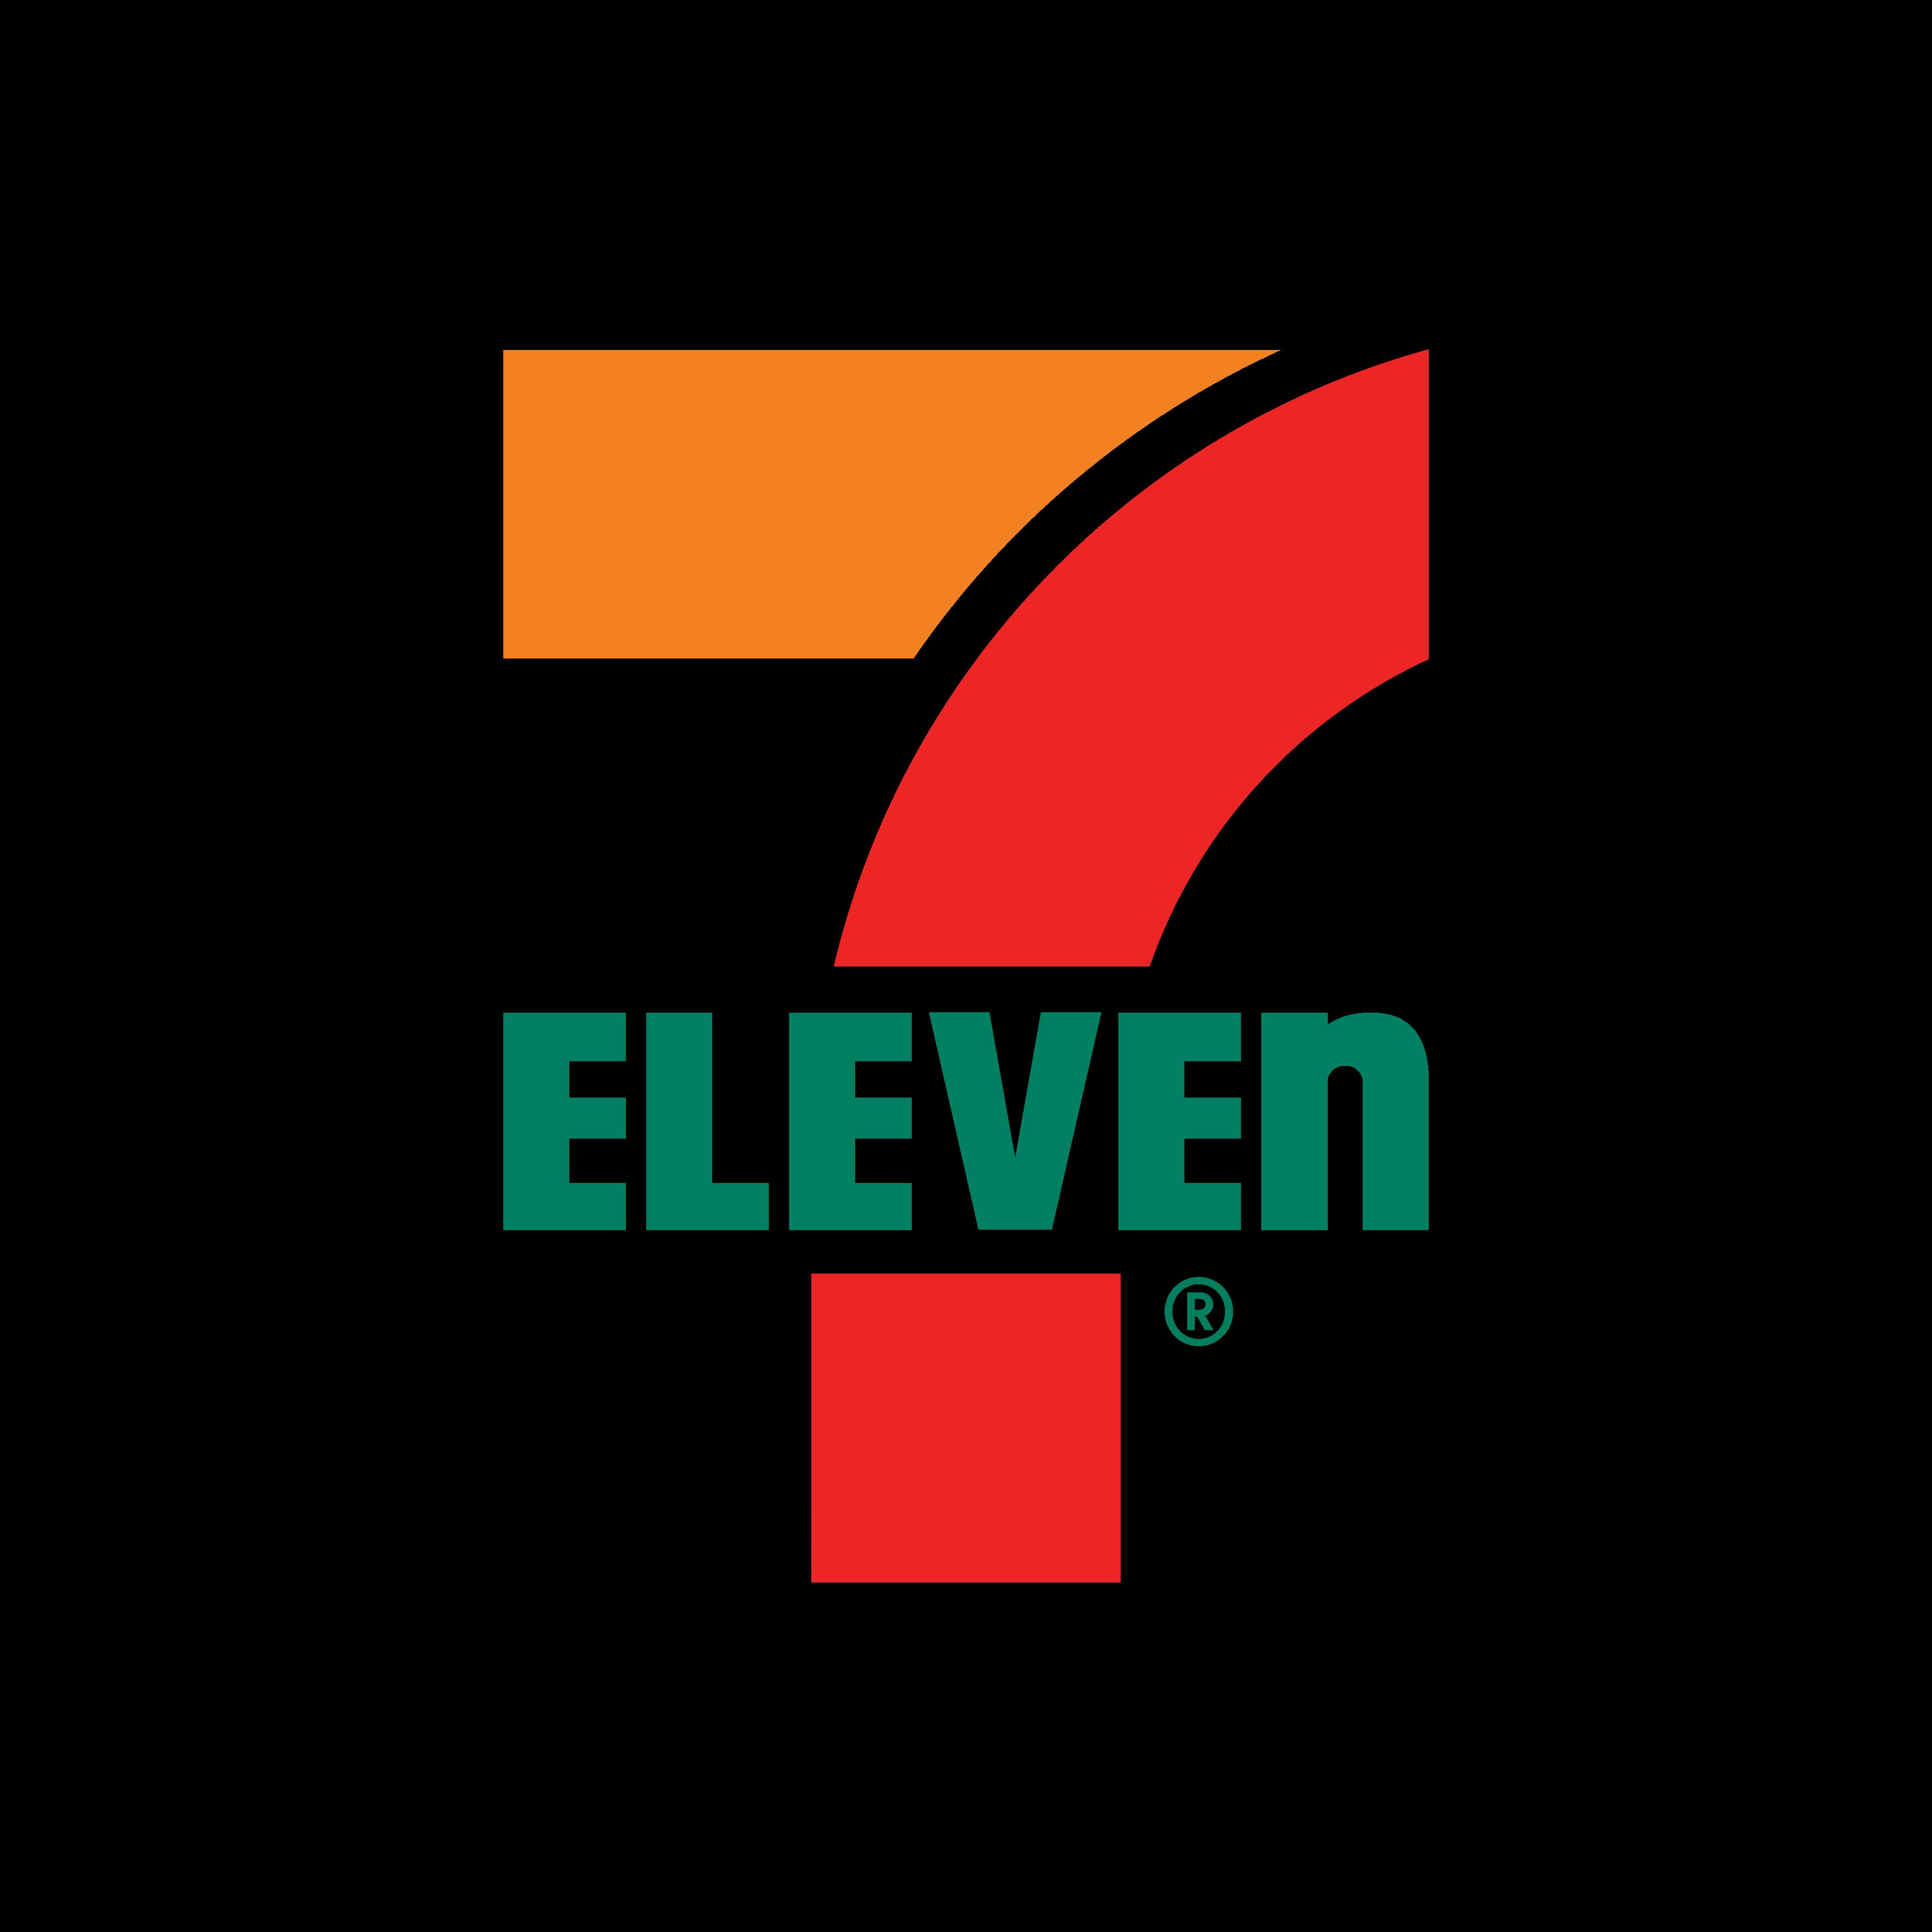 7 eleven logo 0 - 7-Eleven Logo